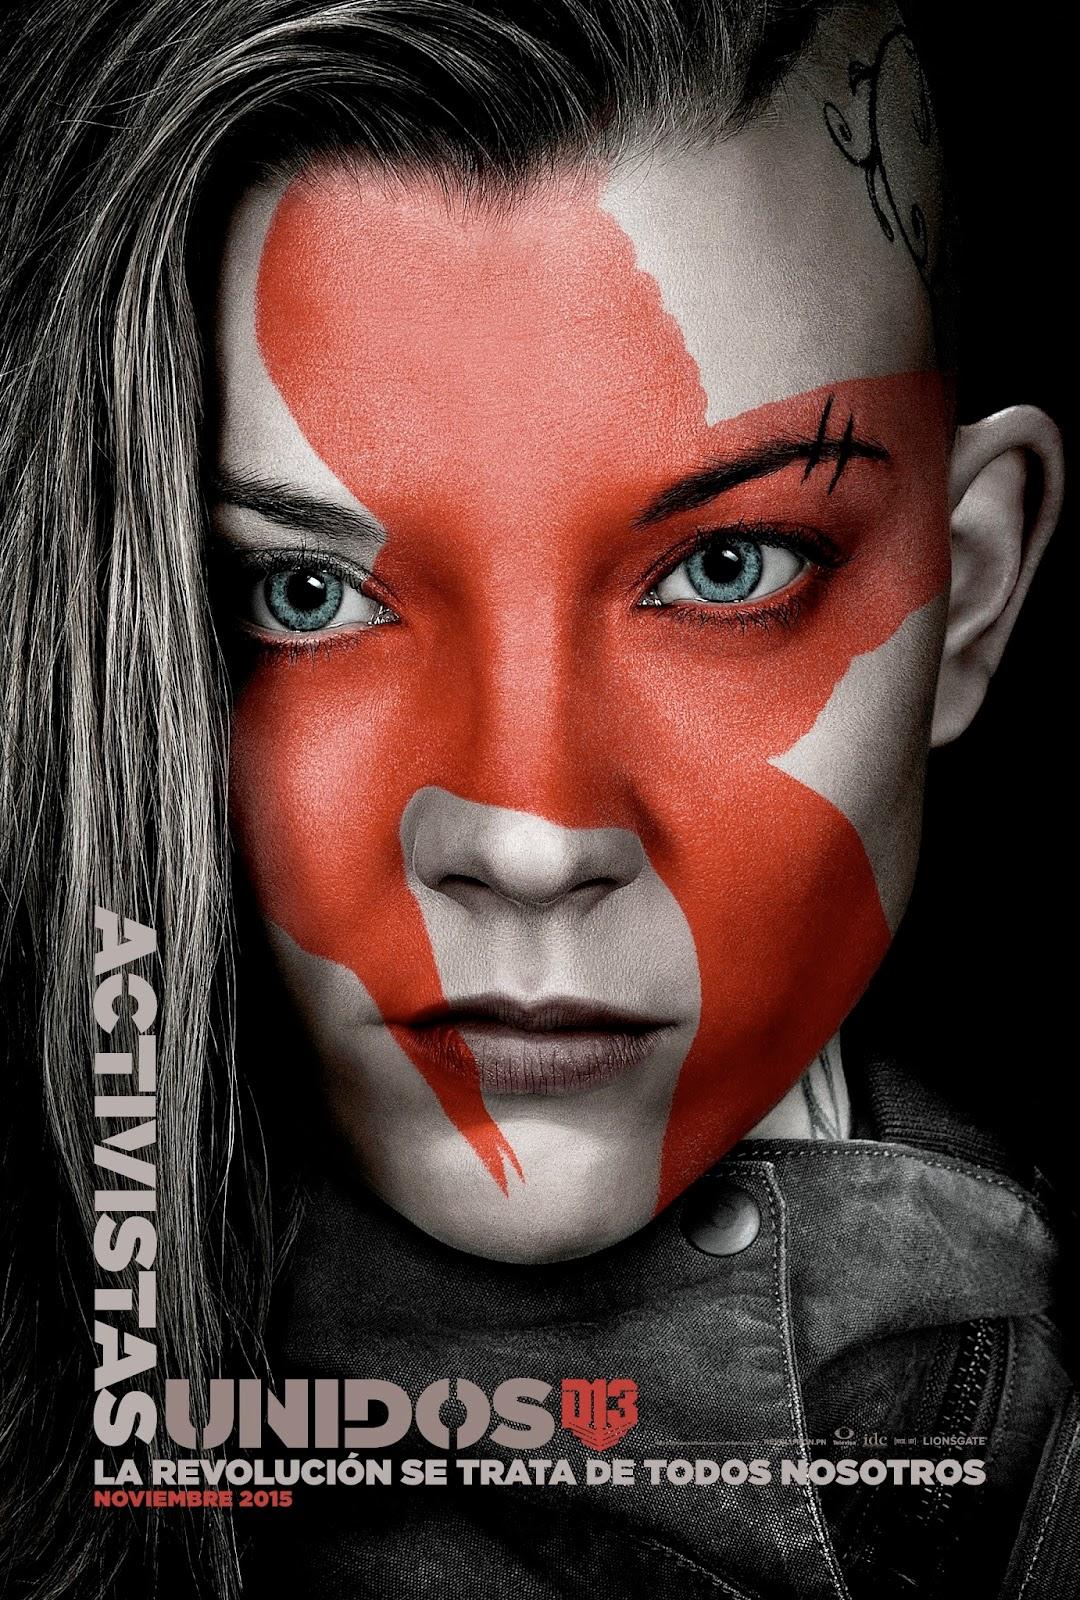 Fielalcine Blogspot Com Liberan Primeros Afiches De Los Juegos Del